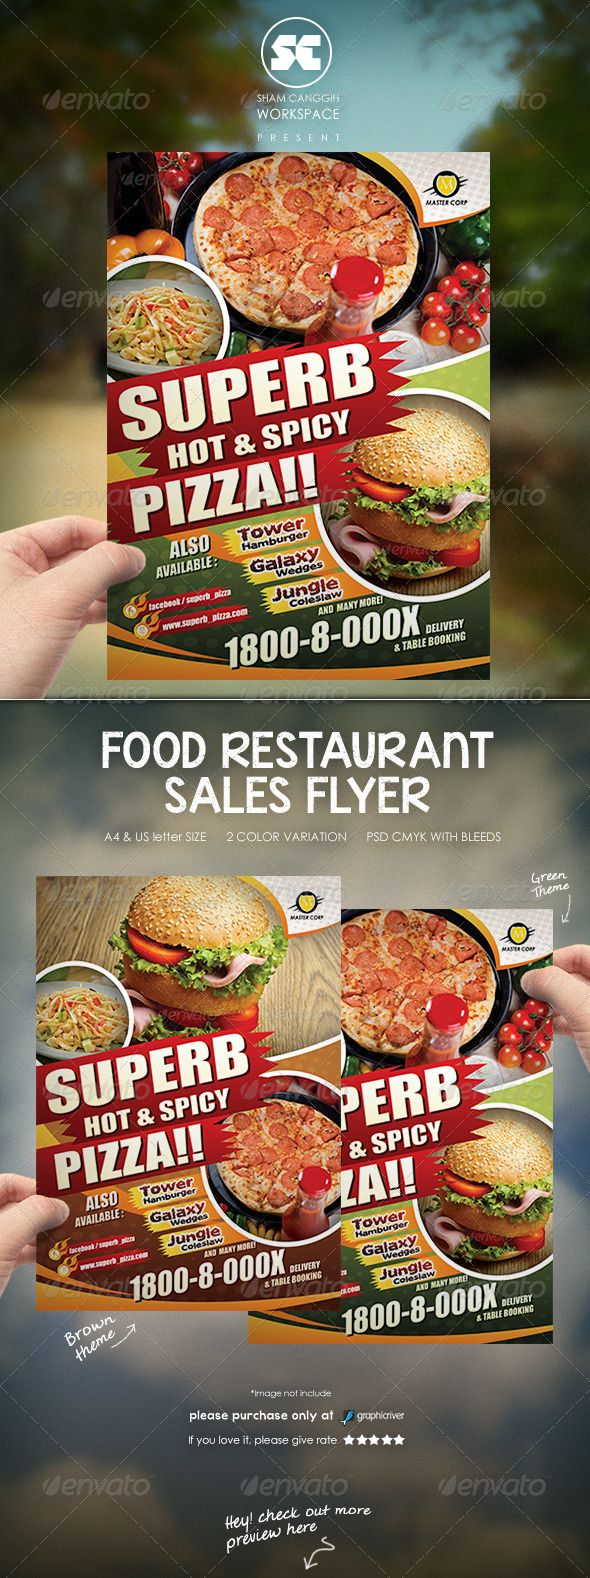 Restaurant Food Flyer Template #design Download: http://graphicriver.net/item/restaurant-food-flyer/7526847?ref=ksioks